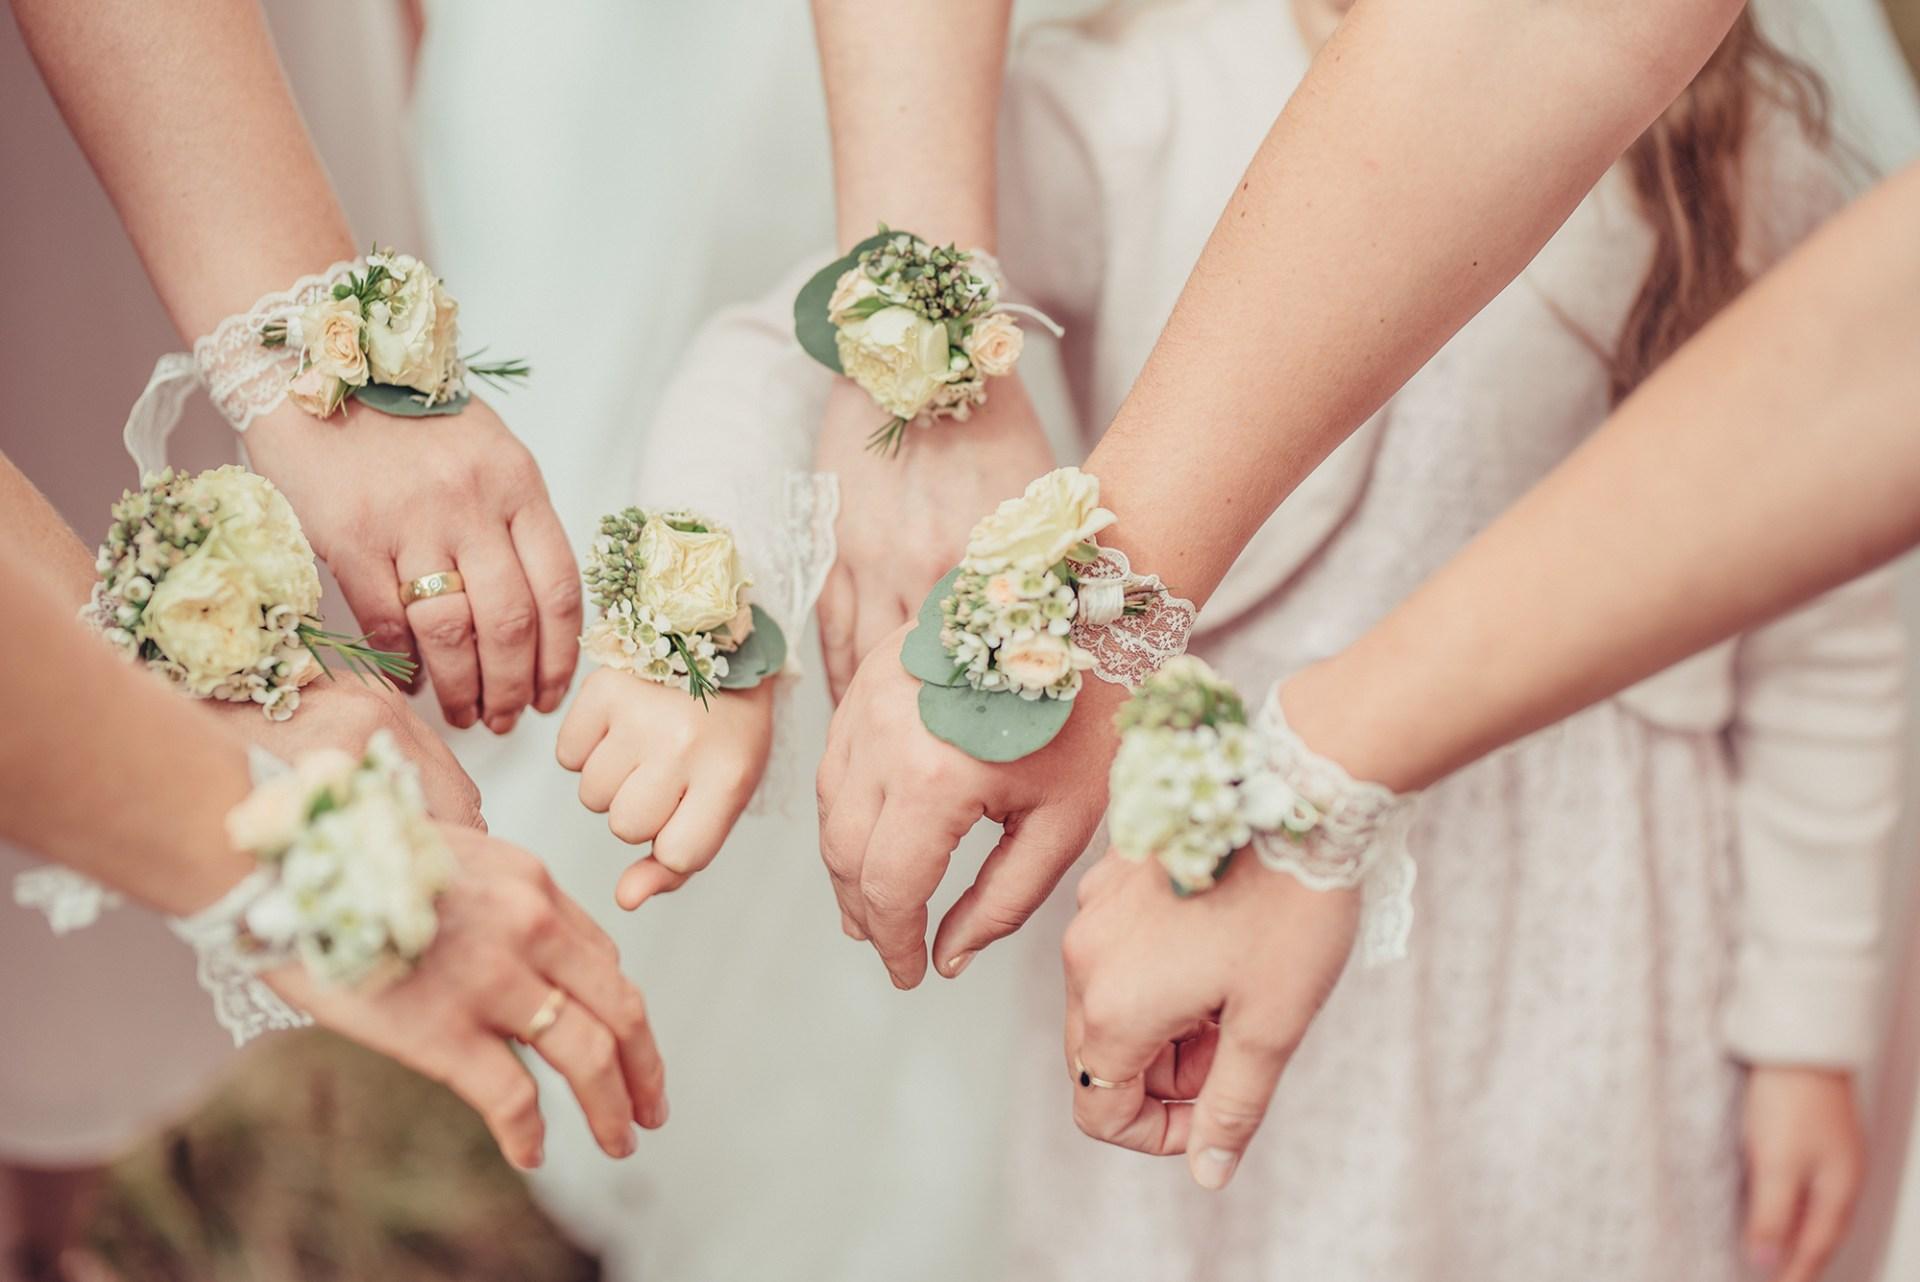 weddingseptemberluminoxx92348234186